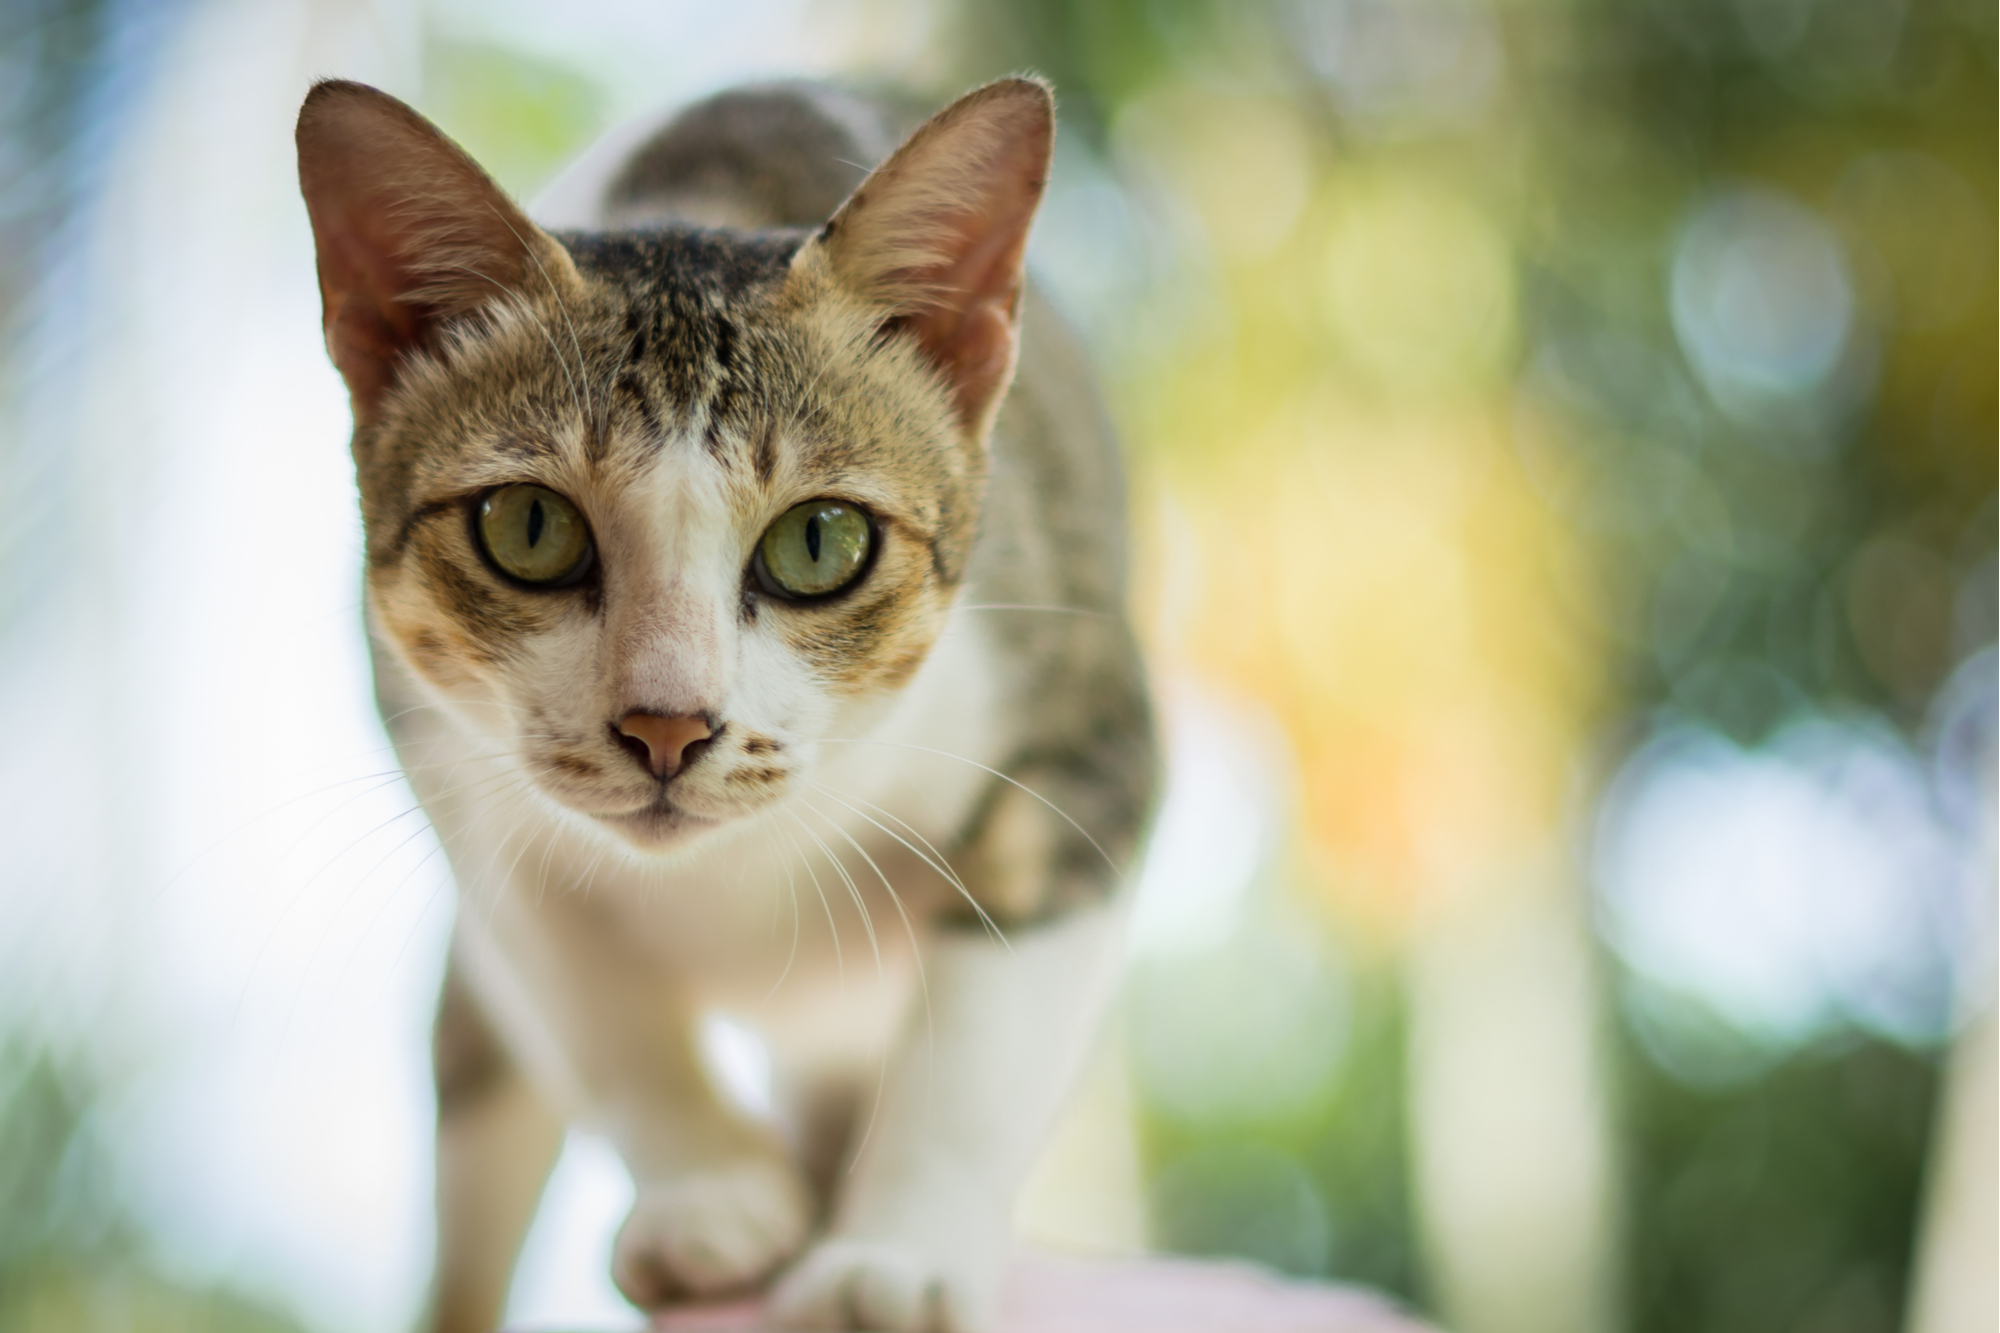 Gato tailandês-72ppi